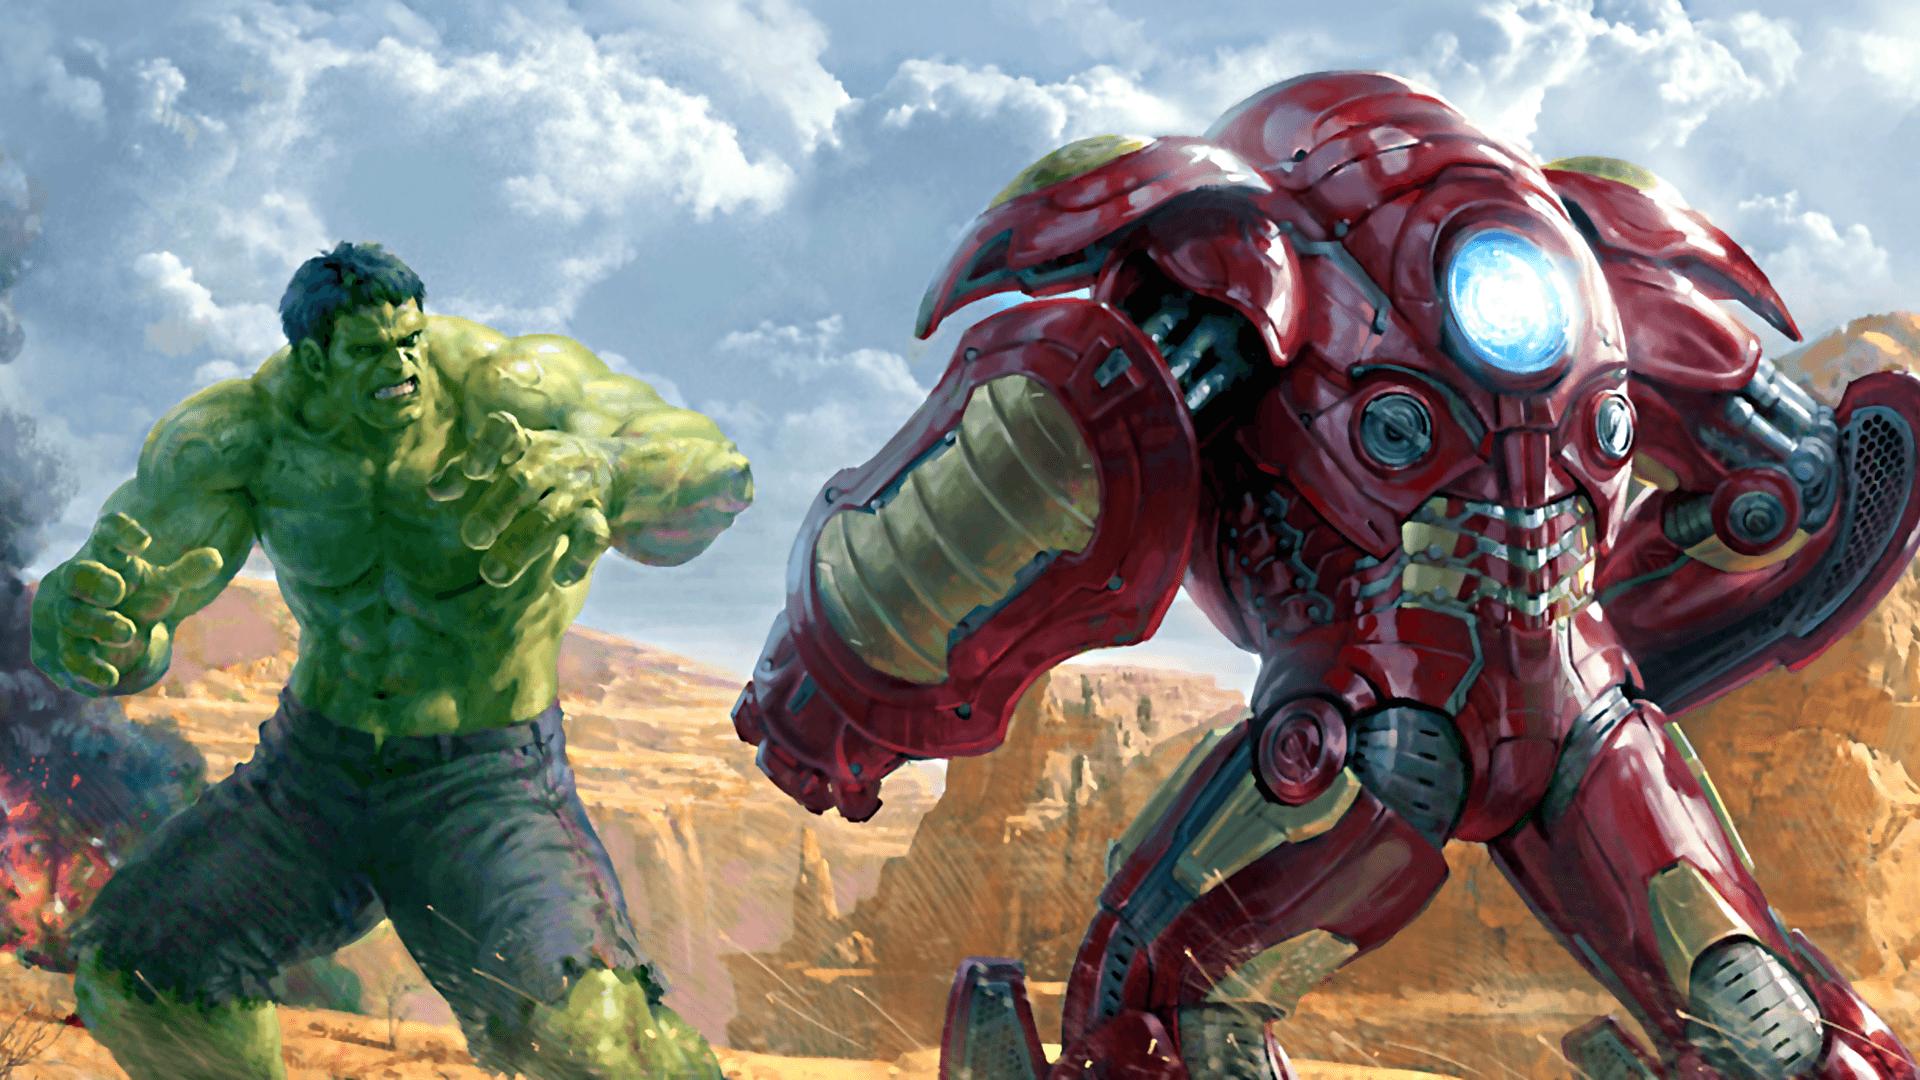 Hd wallpaper hulk - Hulkbuster Wallpaper Wallpapersafari